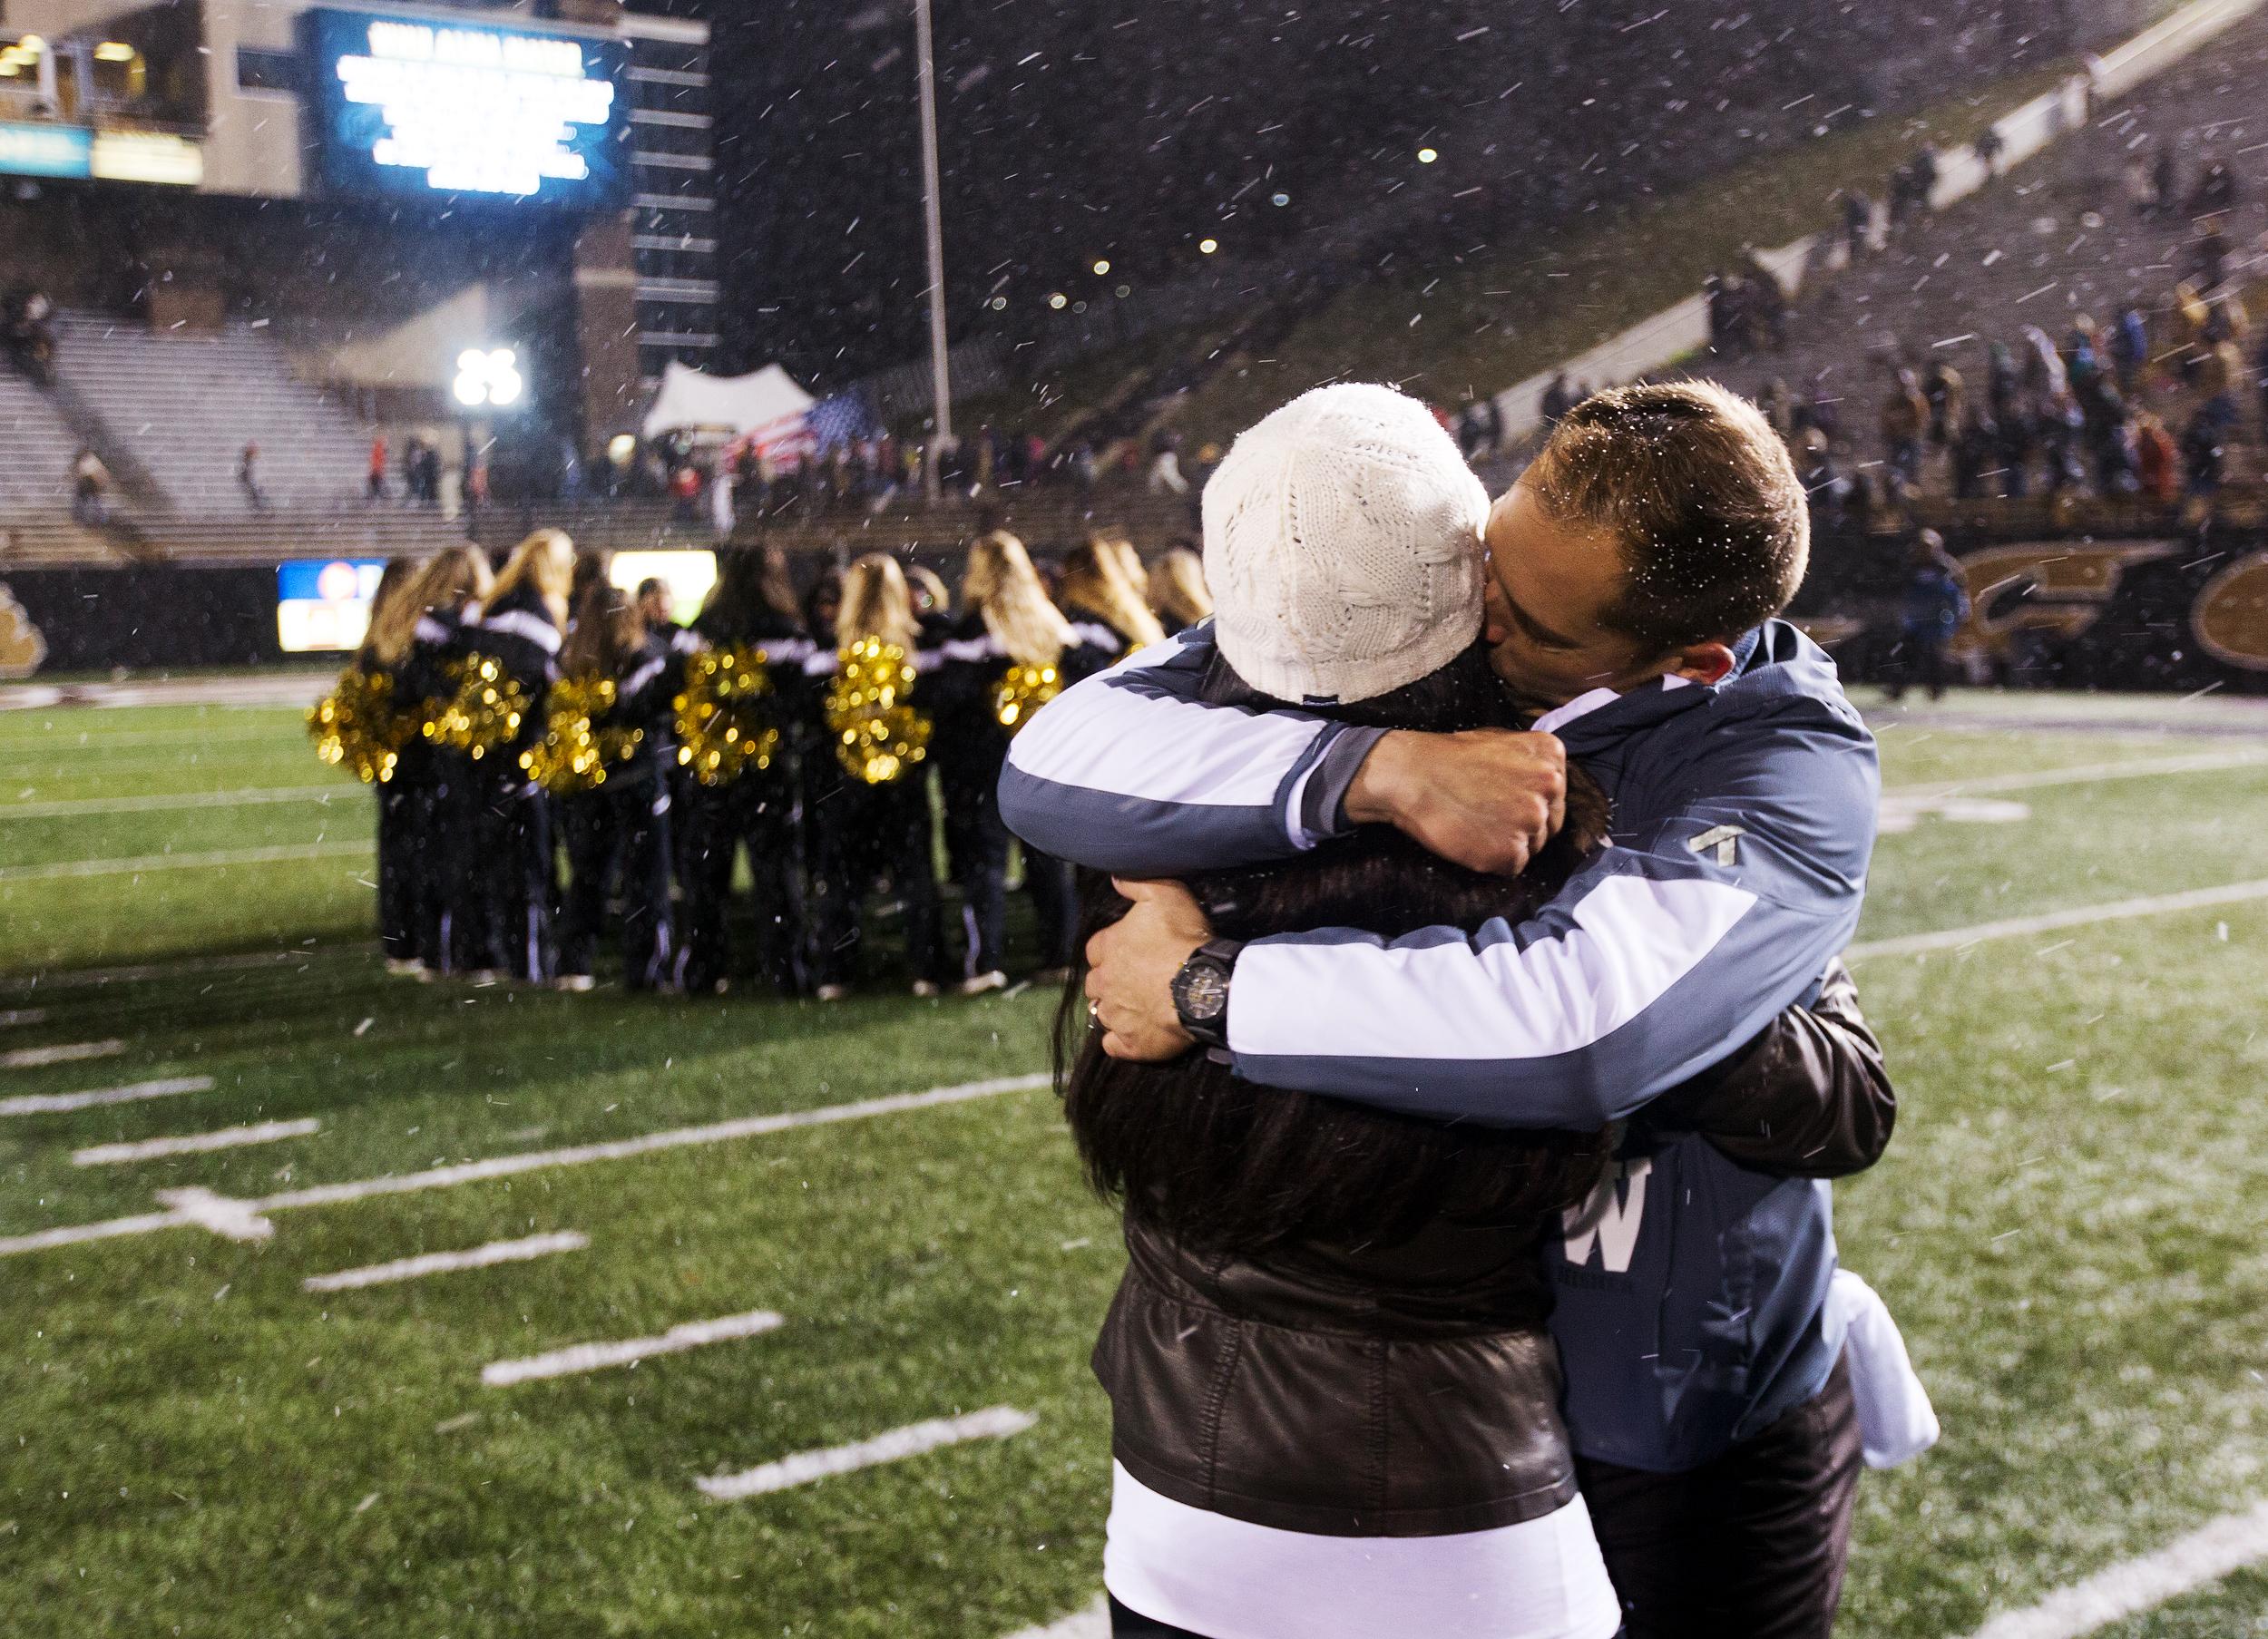 Broncos head coach P.J. Fleck kisses his wife Heather Fleck after his team defeated the Buffalo Bulls 38-0 on Nov. 19, 2016.